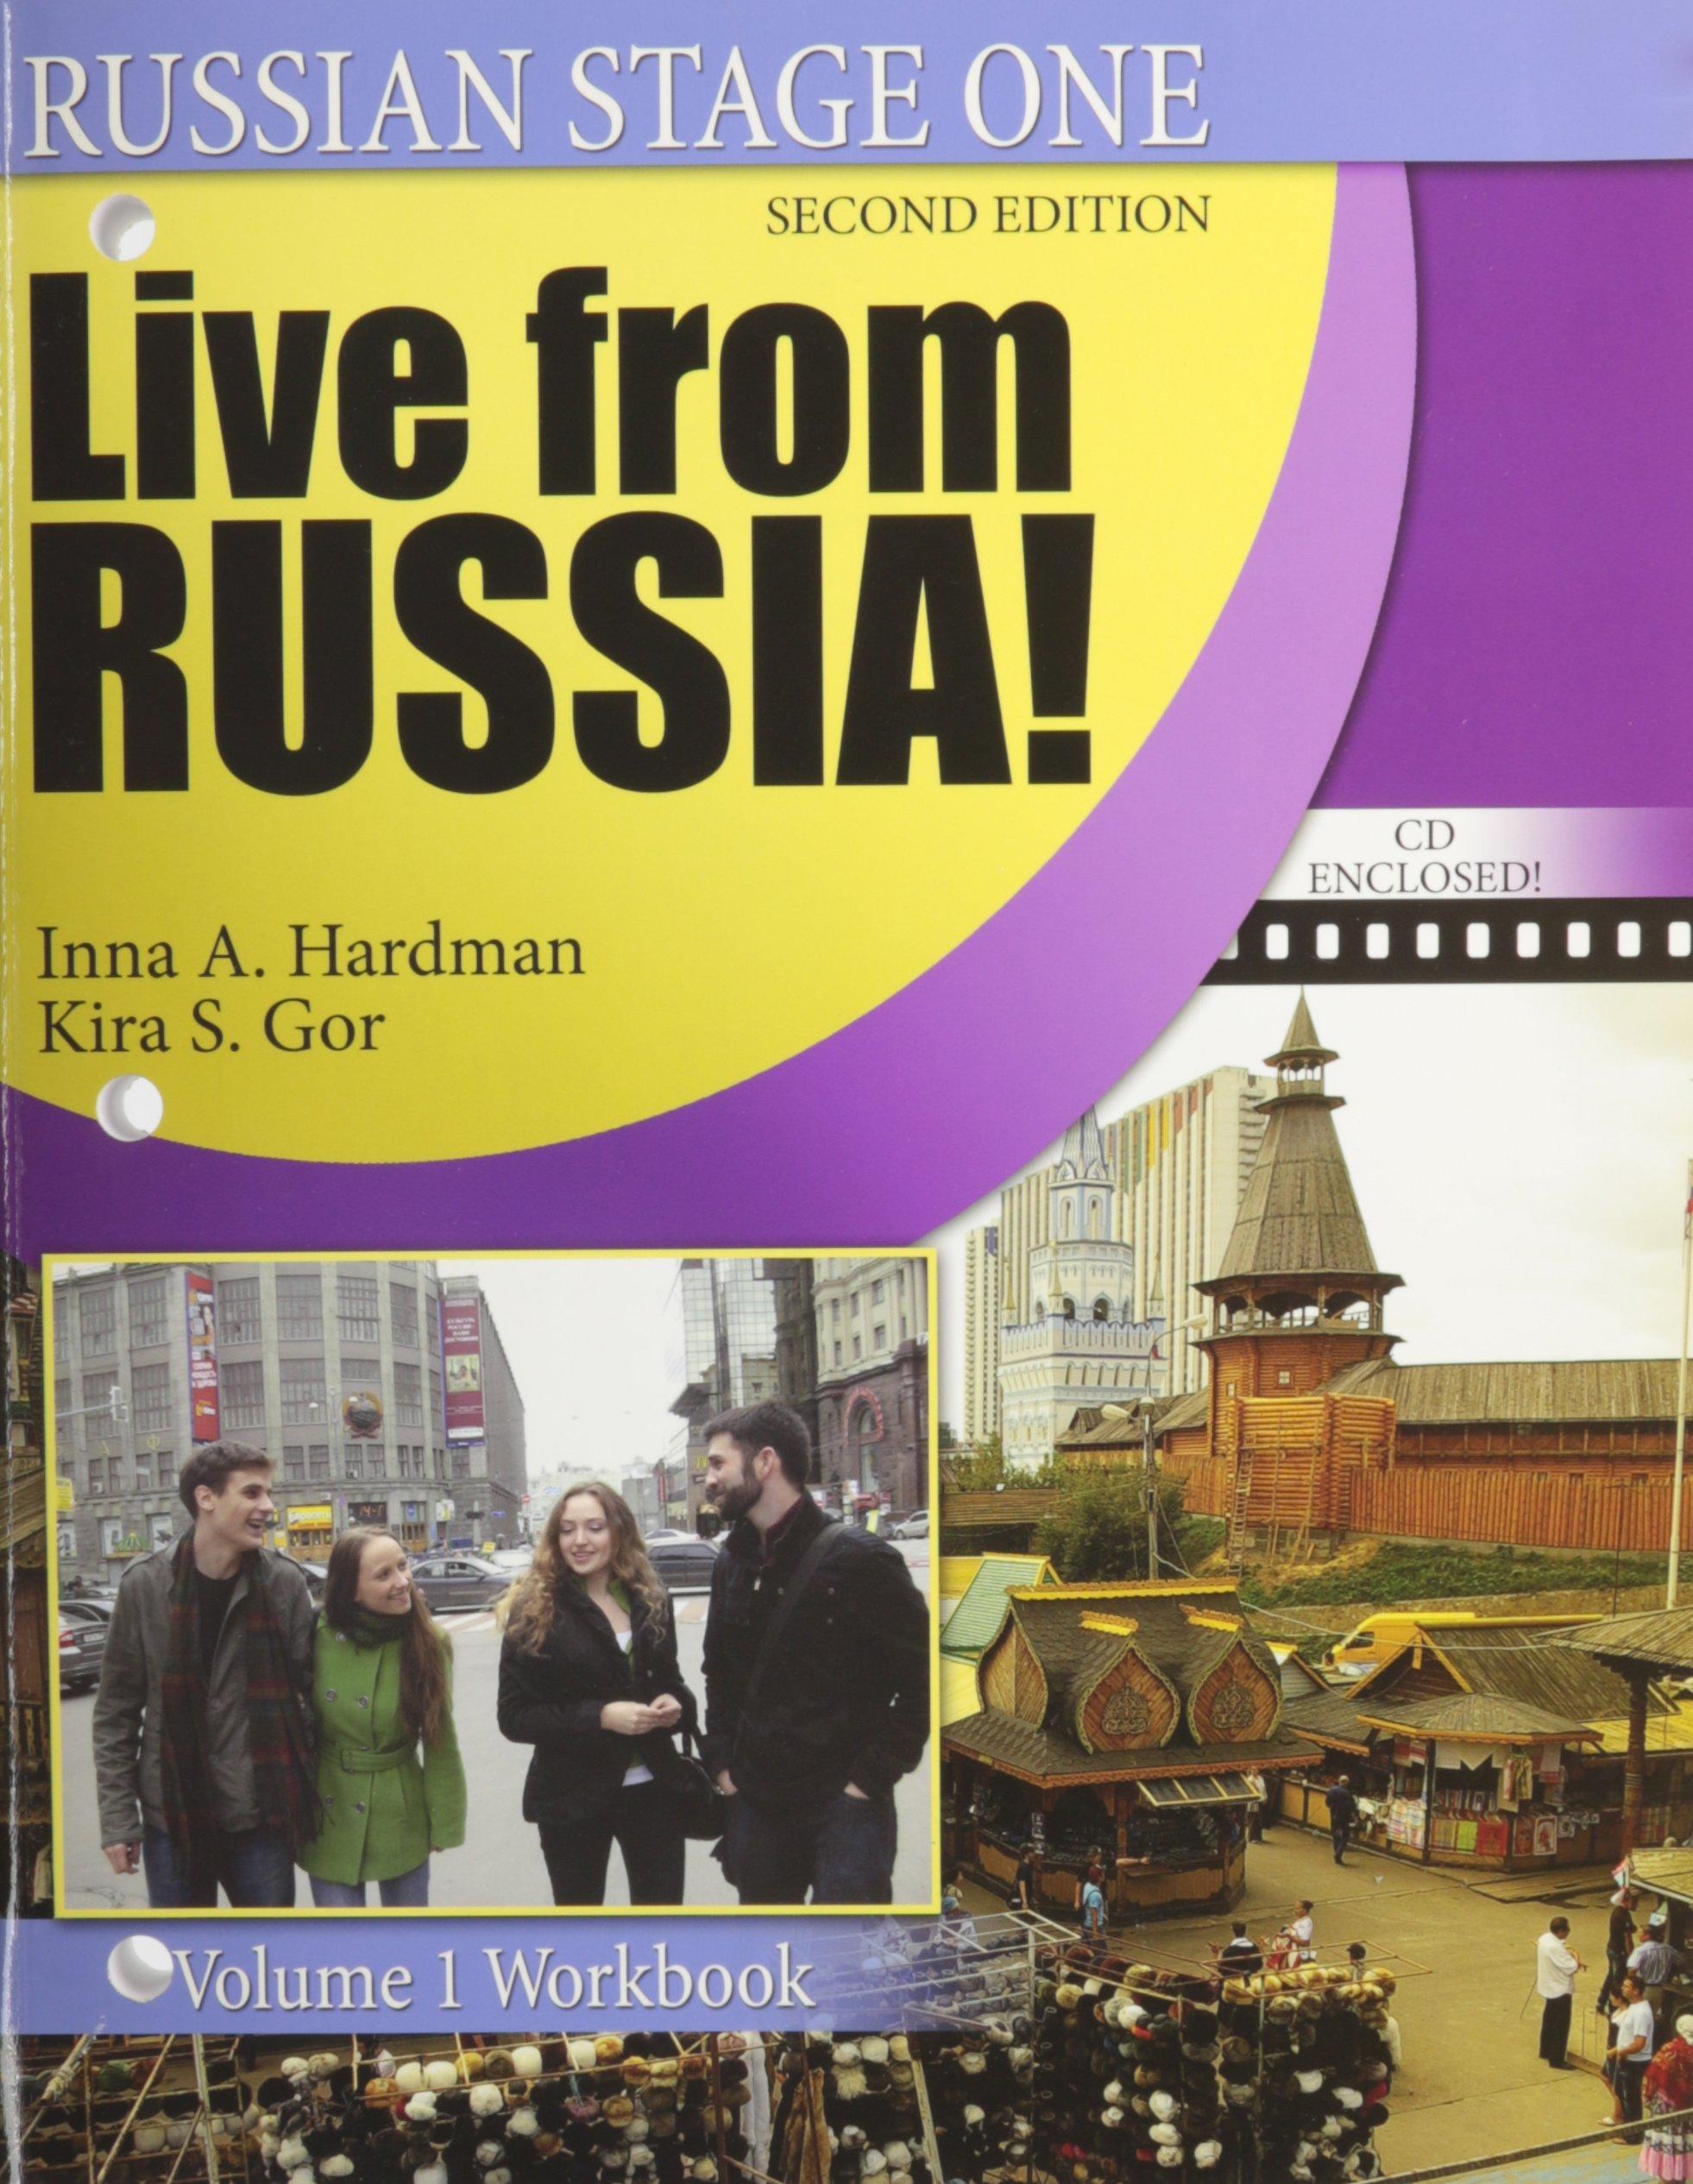 Russian Stage One / Live from Russia! : Volume 1 - Workbook [Paperback]:  Inna A. Hardman, Kira S. Gor: 9780757557842: Amazon.com: Books